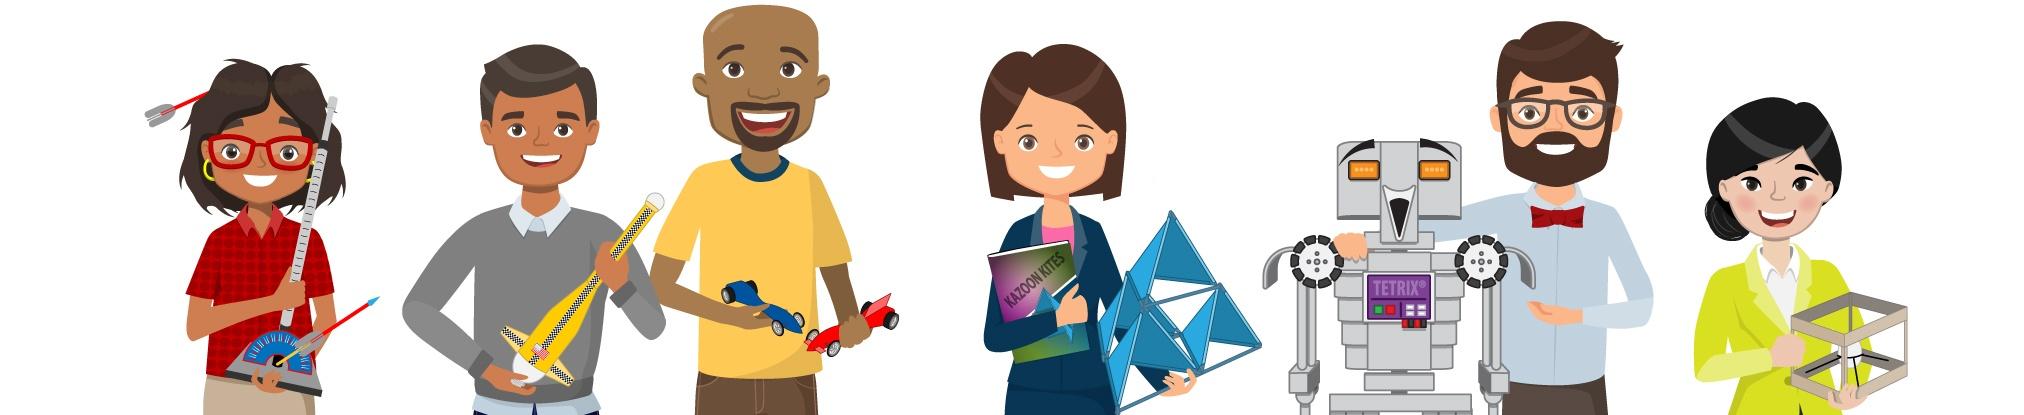 Back-to-school-avatars-2024-0918